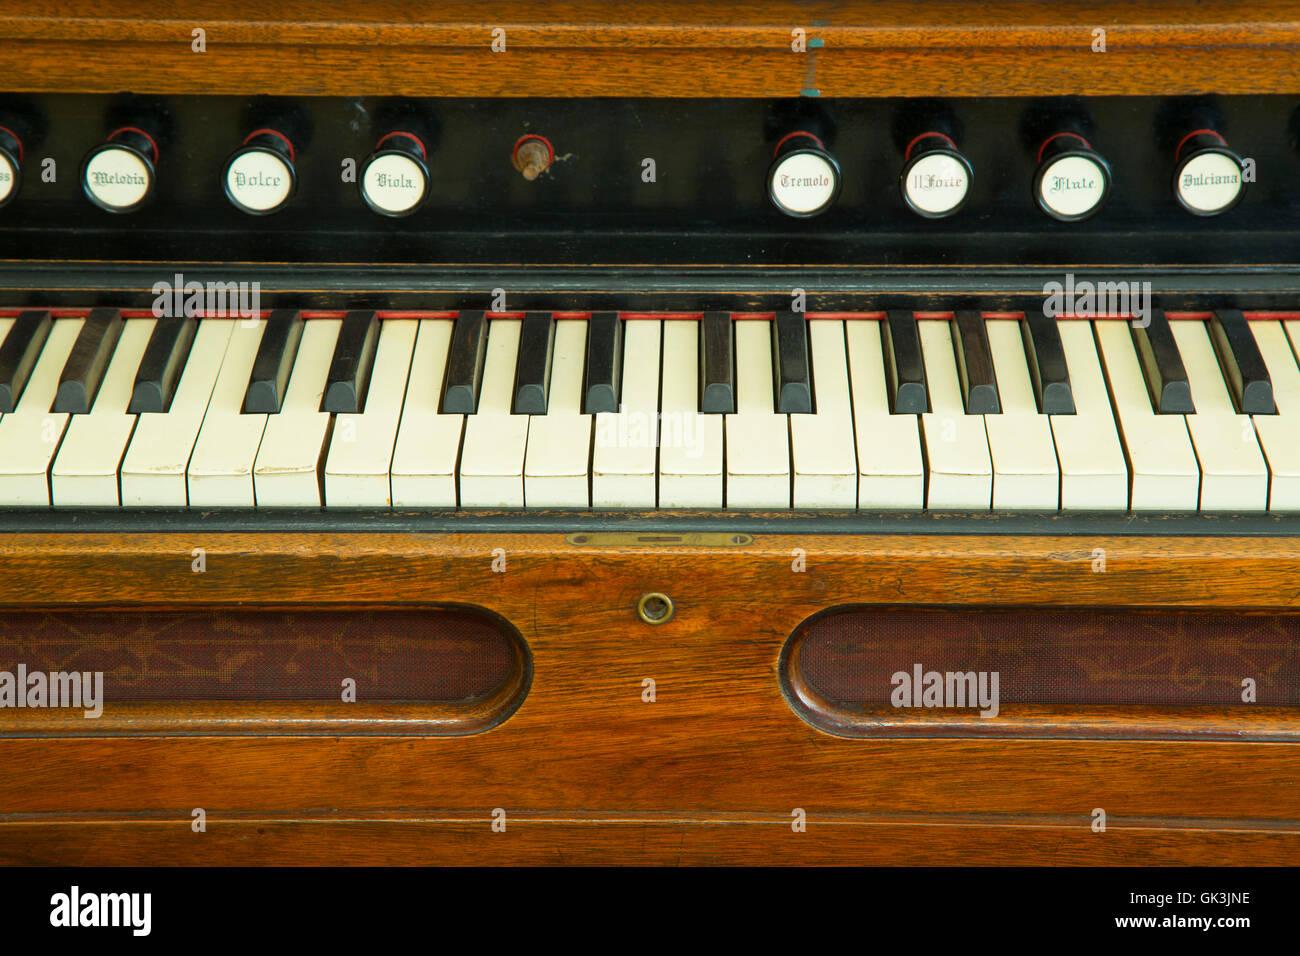 Pump organ keyboard, Shoshone County Mining & Smelting Museum at the Staff House, Kellogg, Idaho - Stock Image